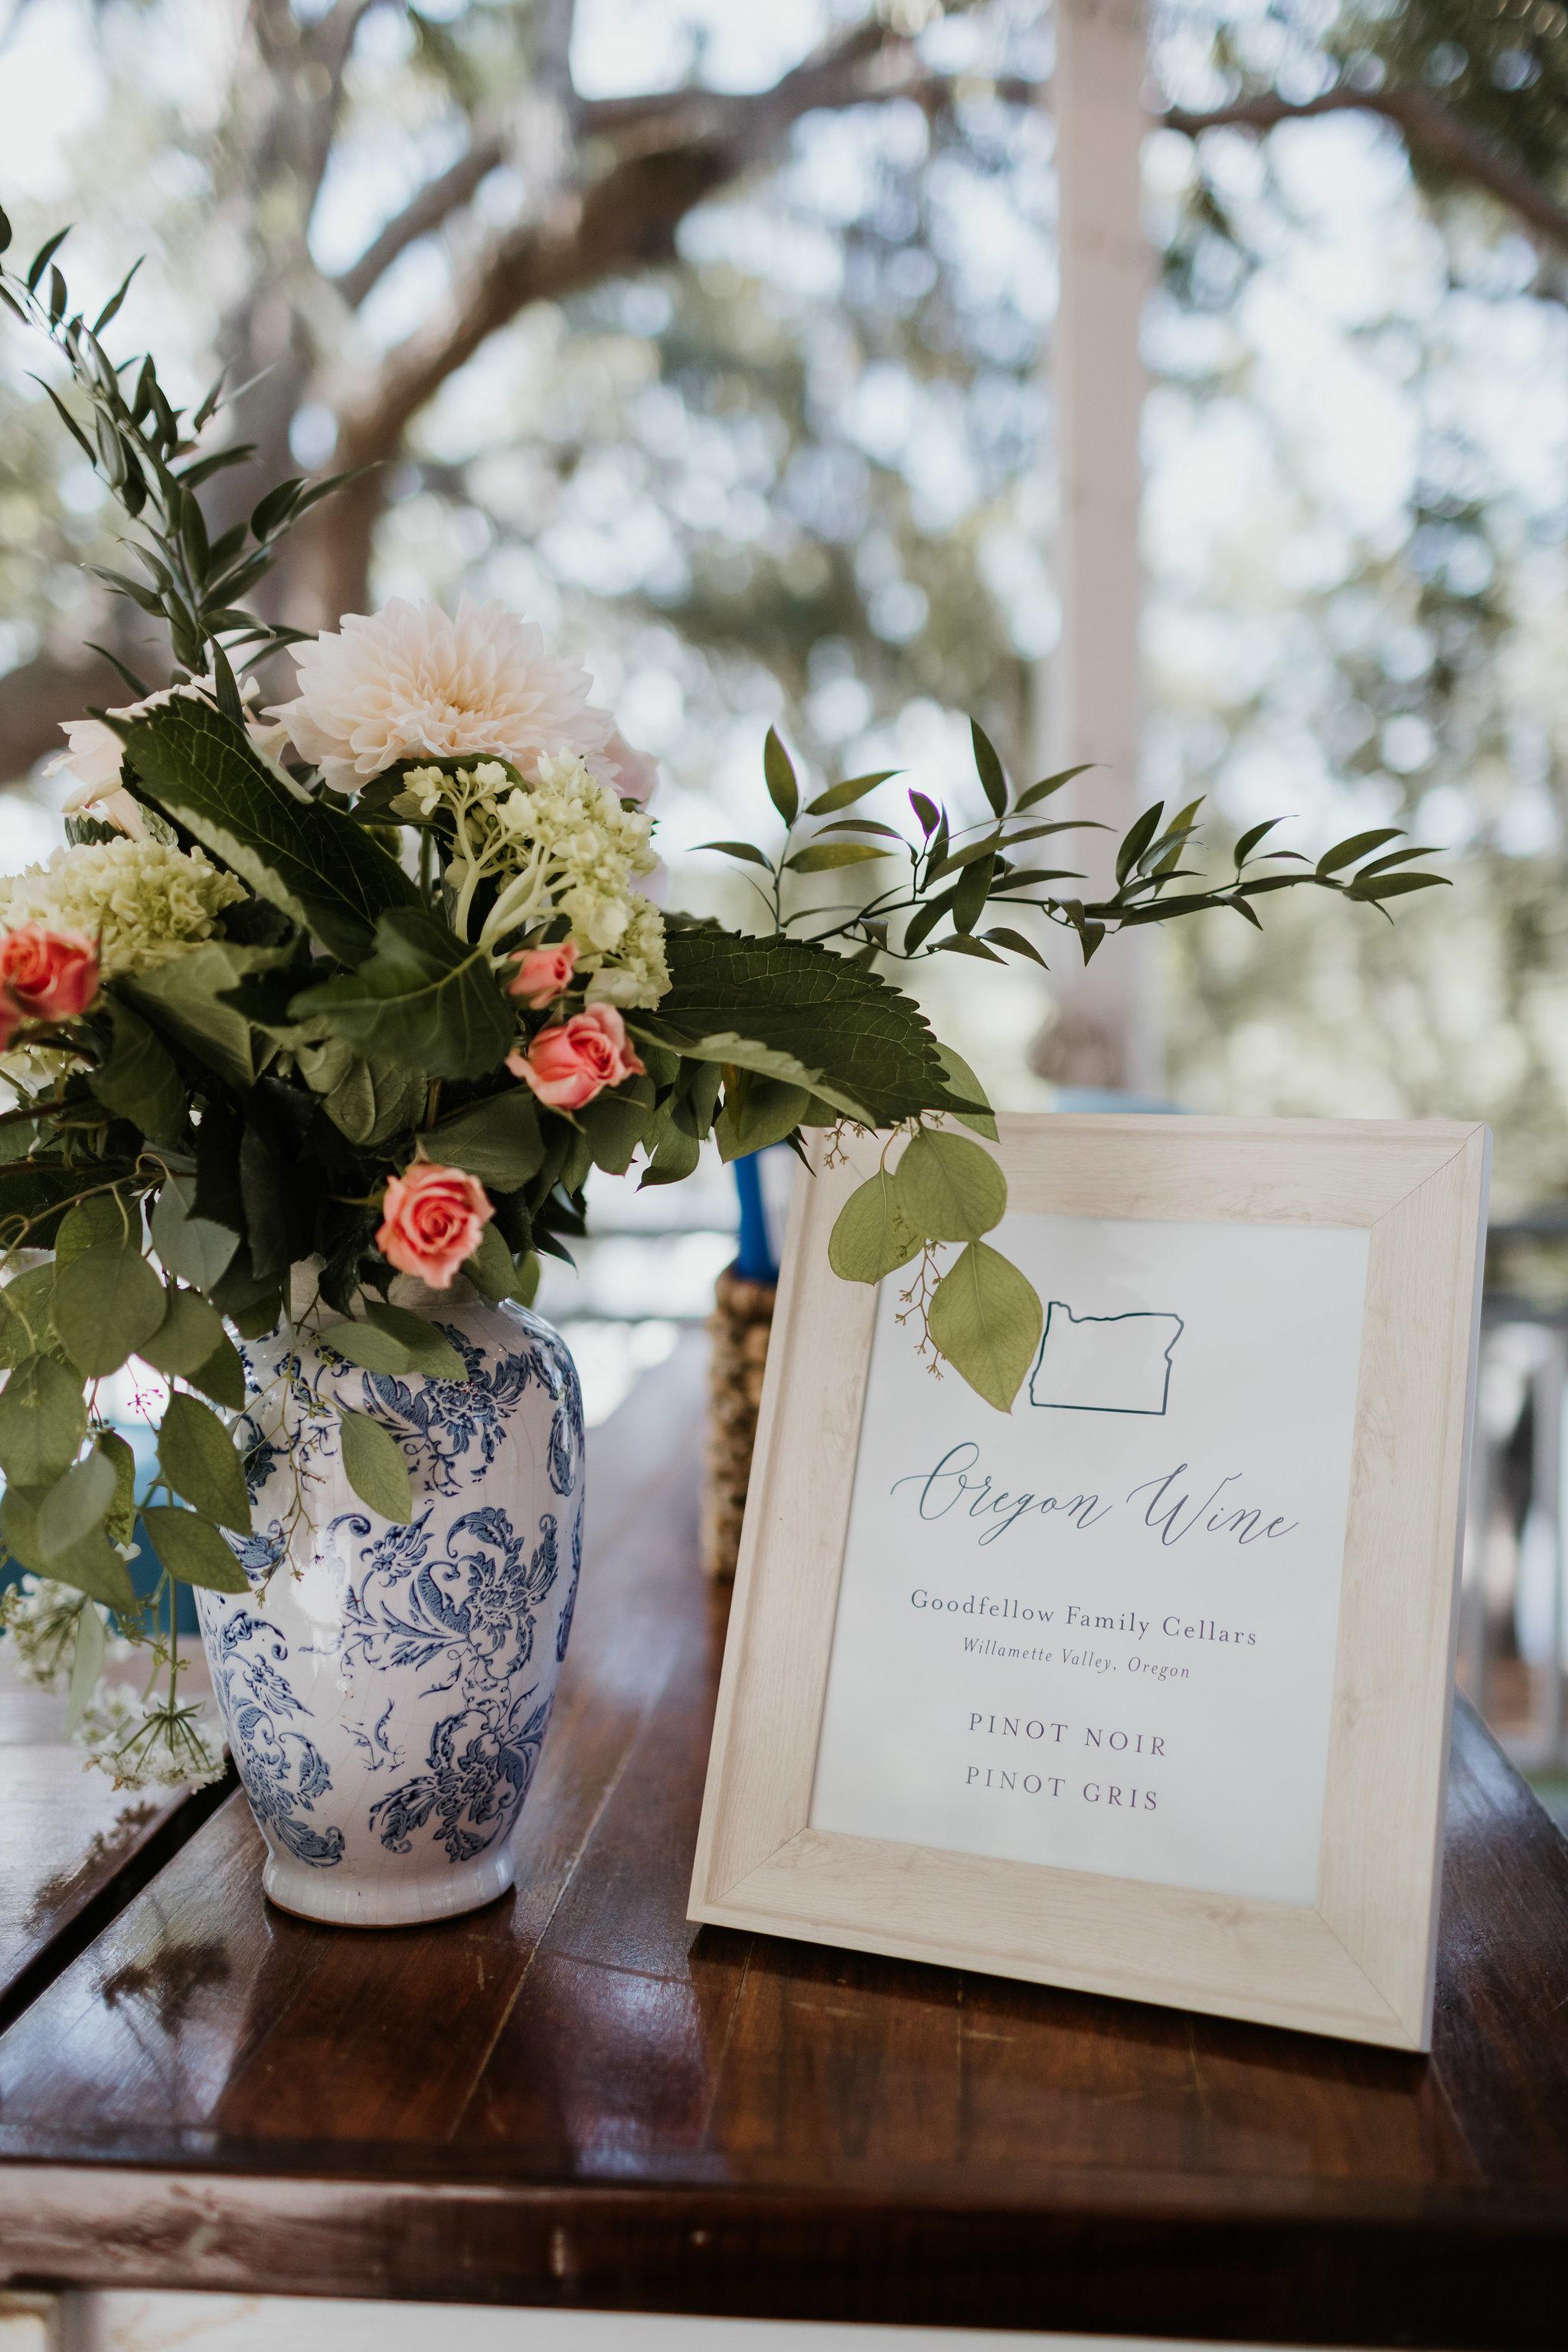 Creekclub-at-Ion-Charleston-SC-wedding-portrait-photographer-429.jpg